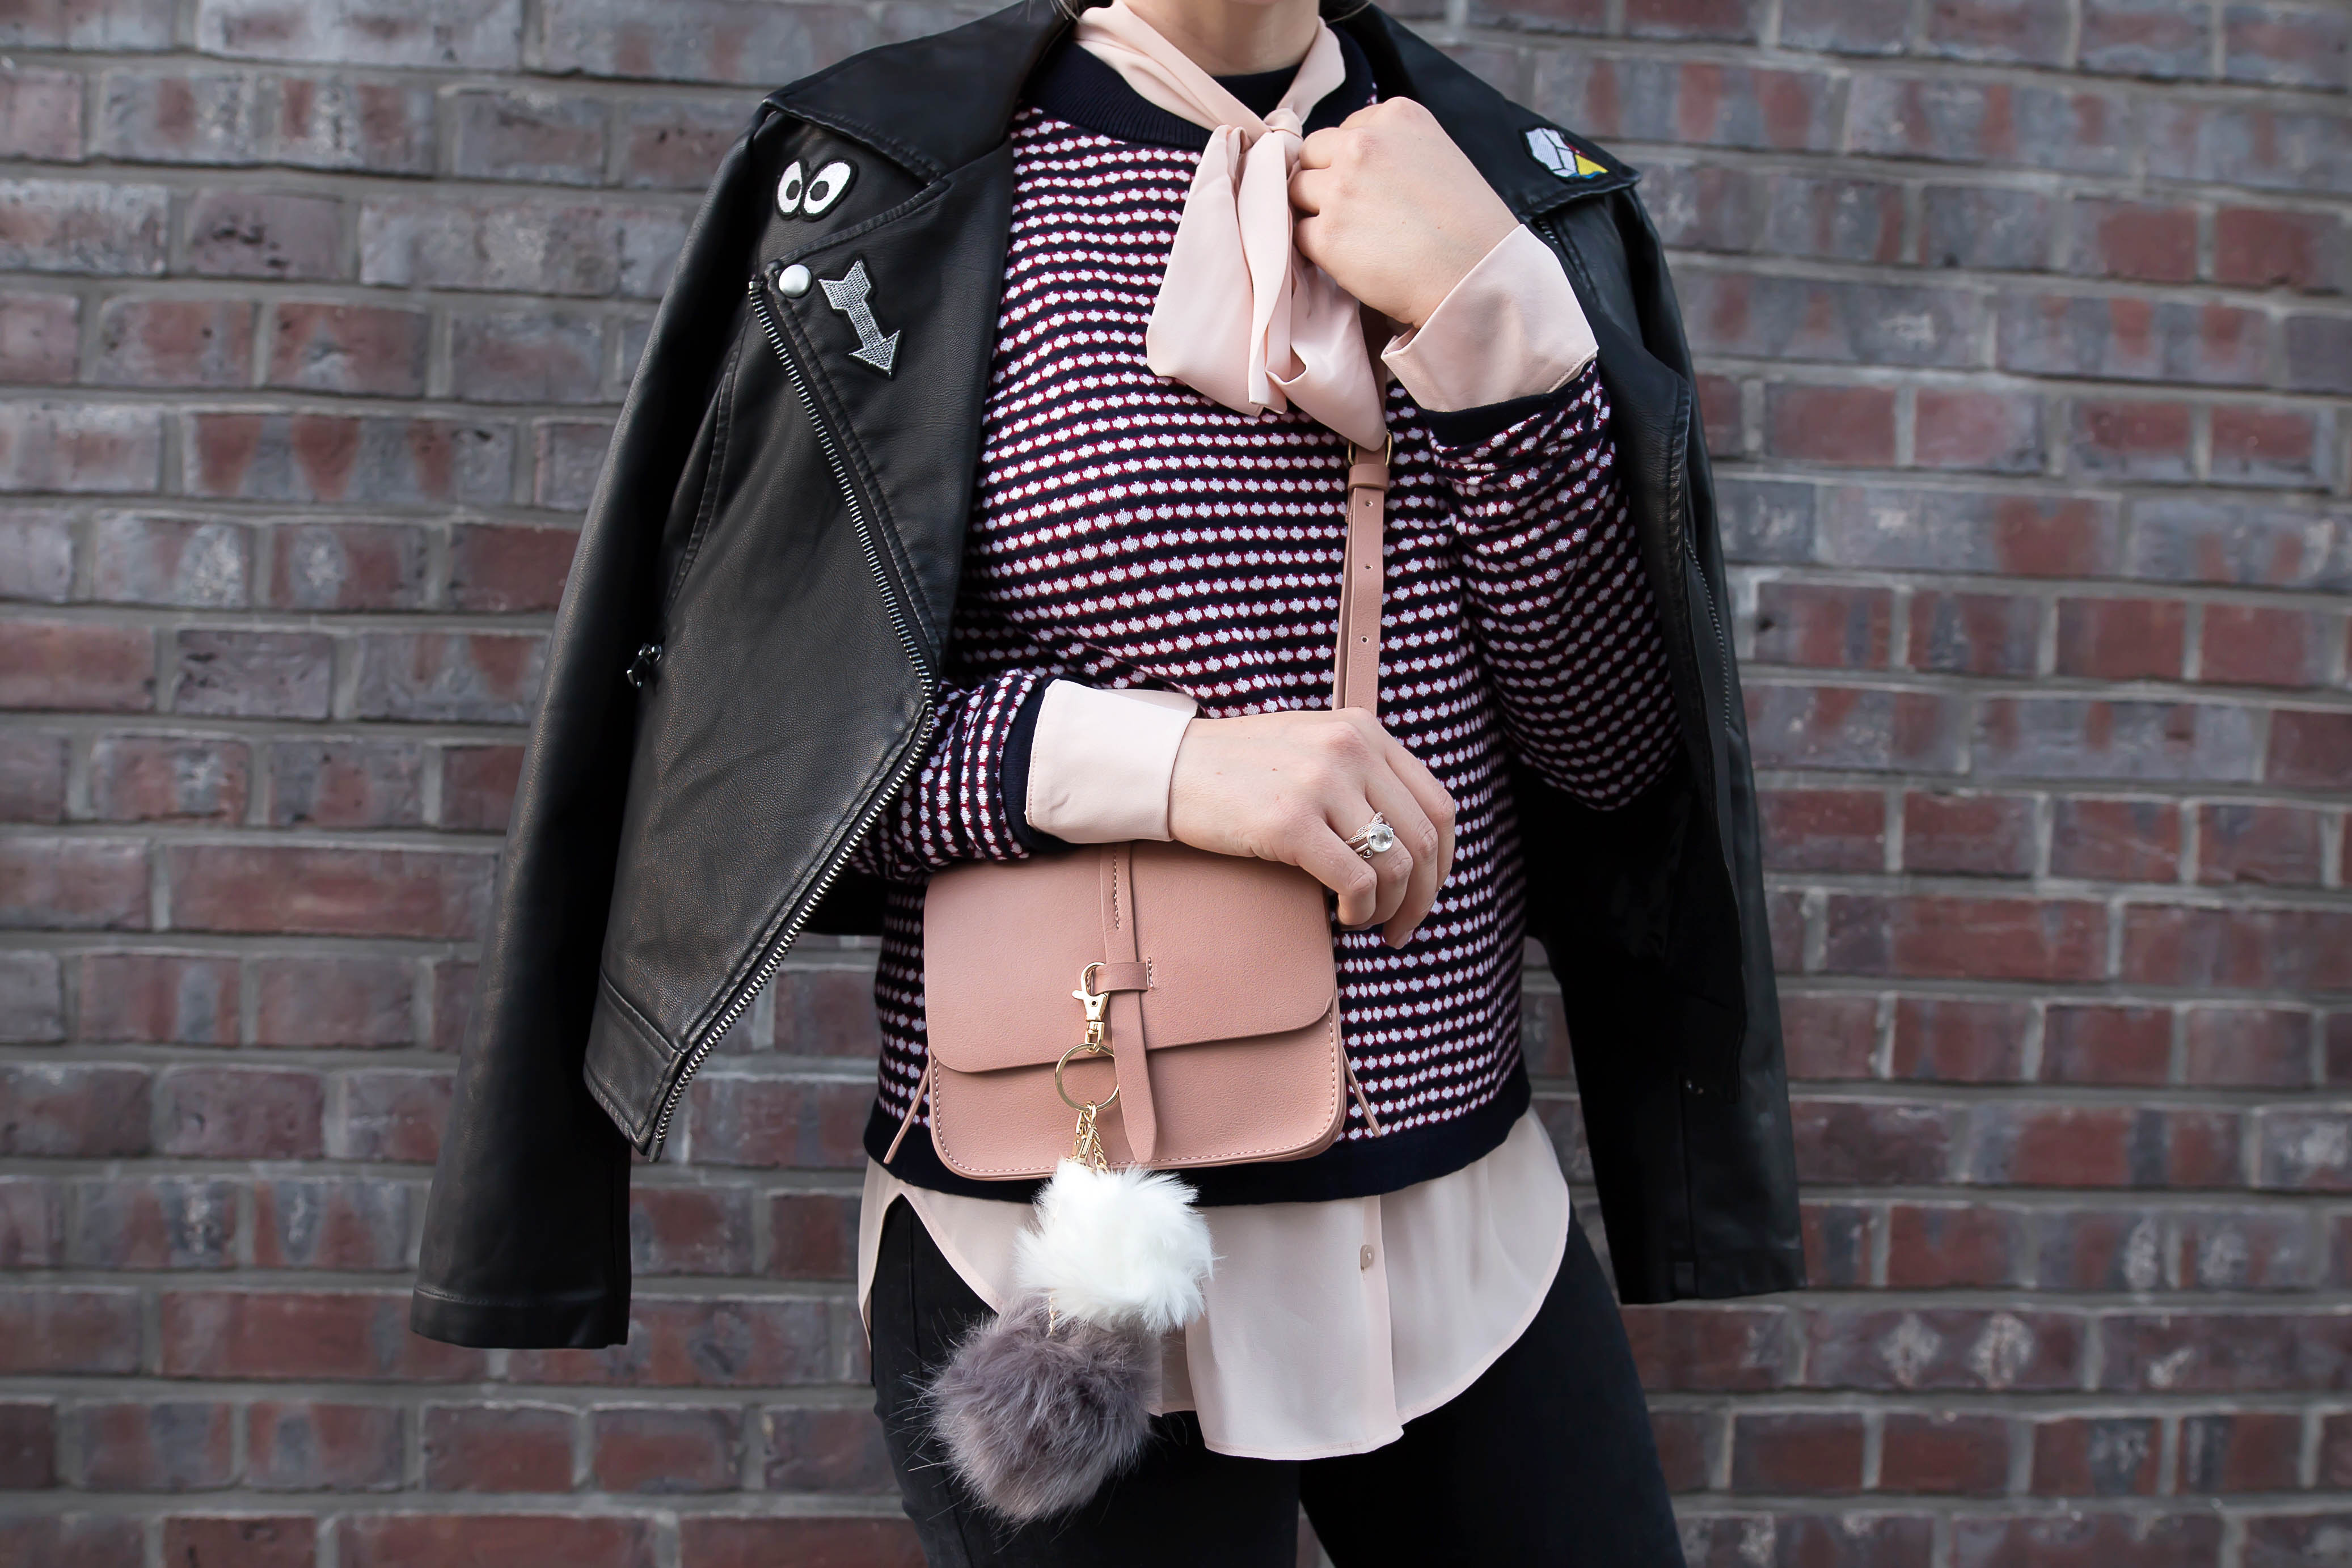 fashion_event_cunda_zara_hundm_shoppen_inspiration_hamburg